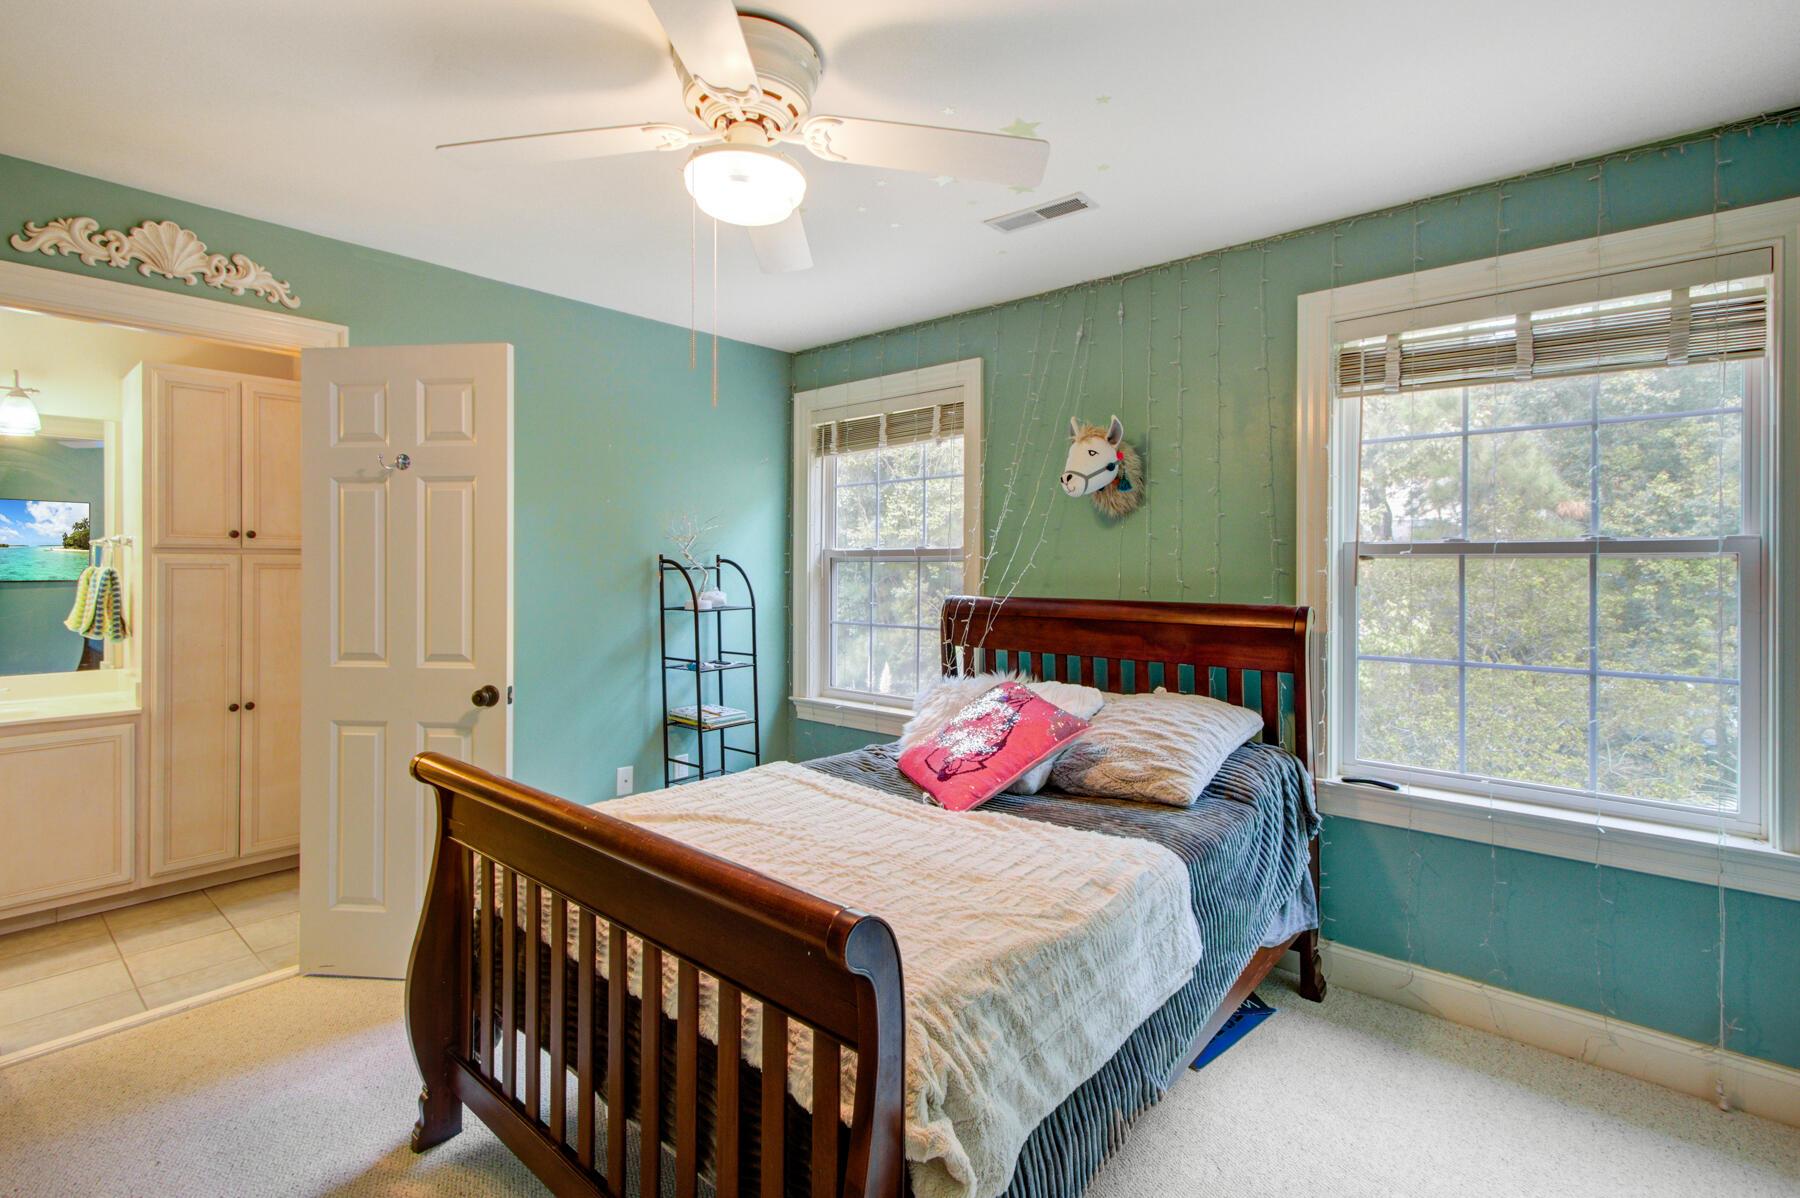 Dunes West Homes For Sale - 3095 Pignatelli, Mount Pleasant, SC - 52